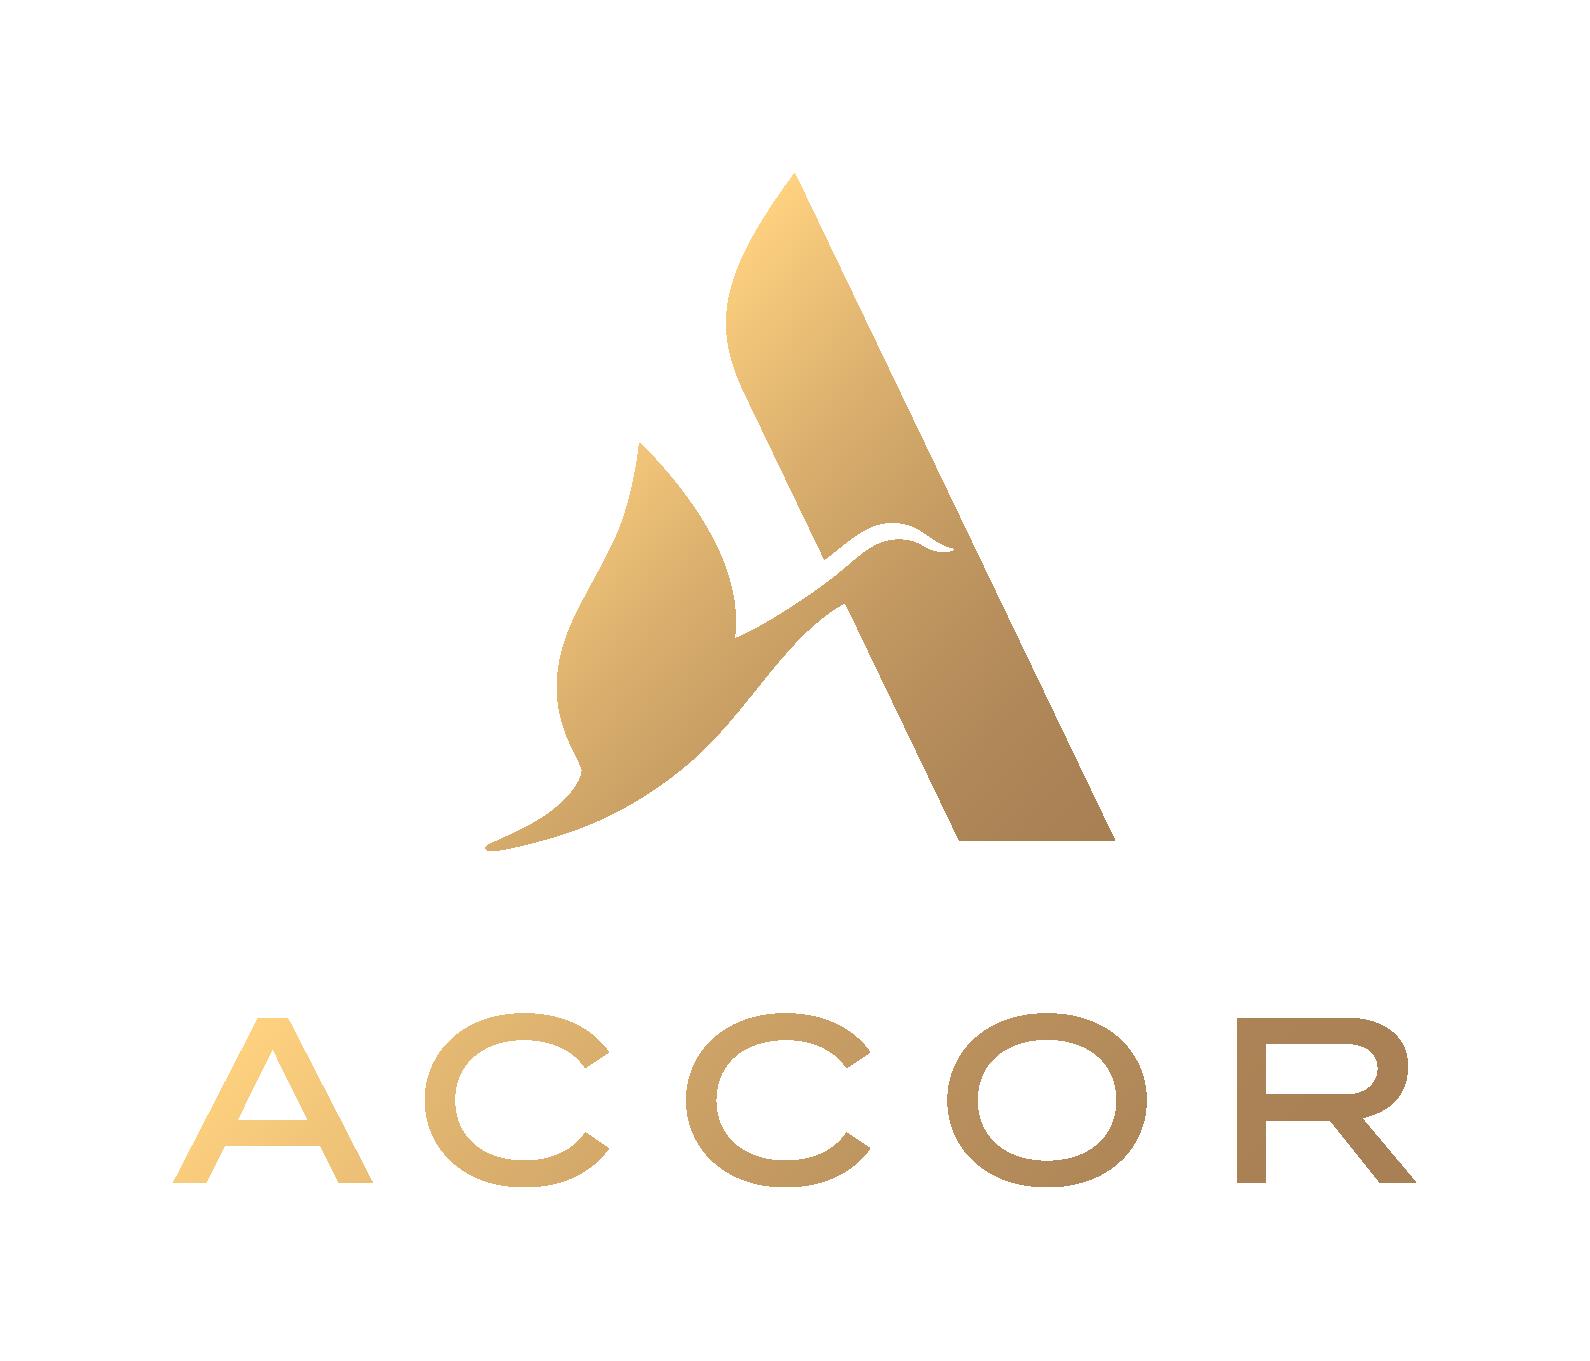 Accor 2019: Iσχυρά αποτελέσματα και επιτυχημένος μετασχηματισμός